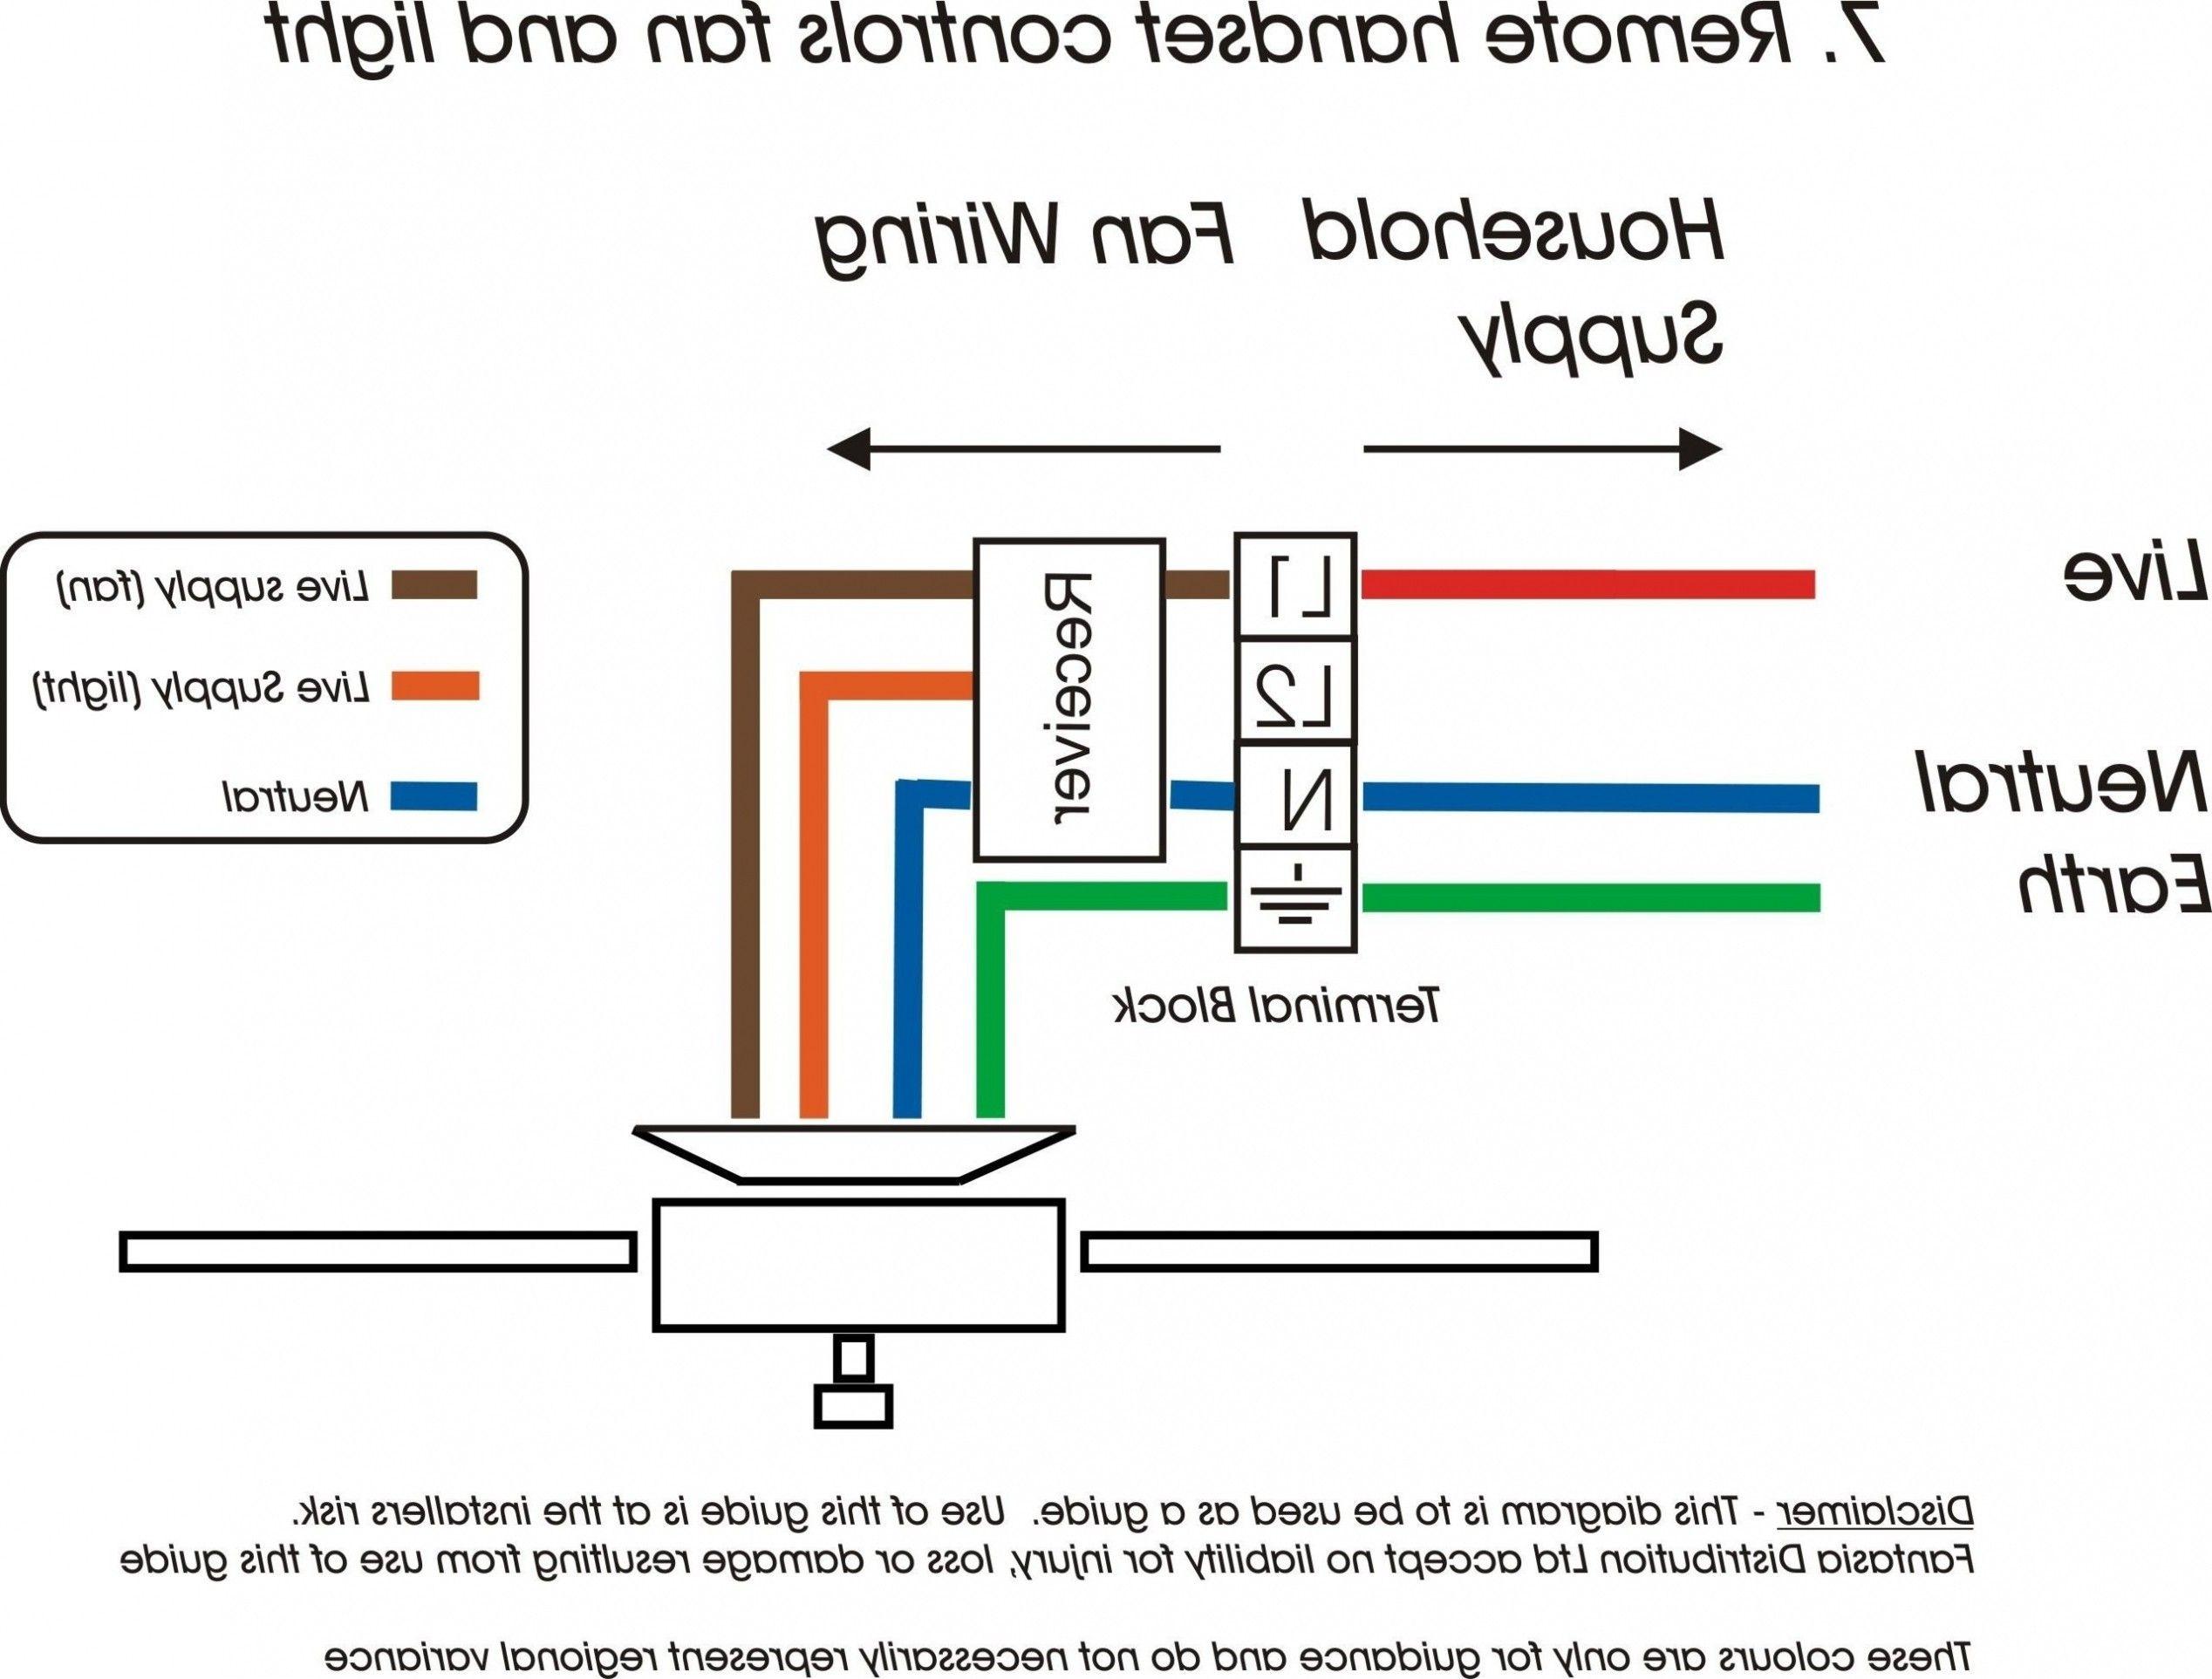 Inspirational Stair Light Switch Wiring Diagram  Diagrams  Digramssample  Diagr U2026